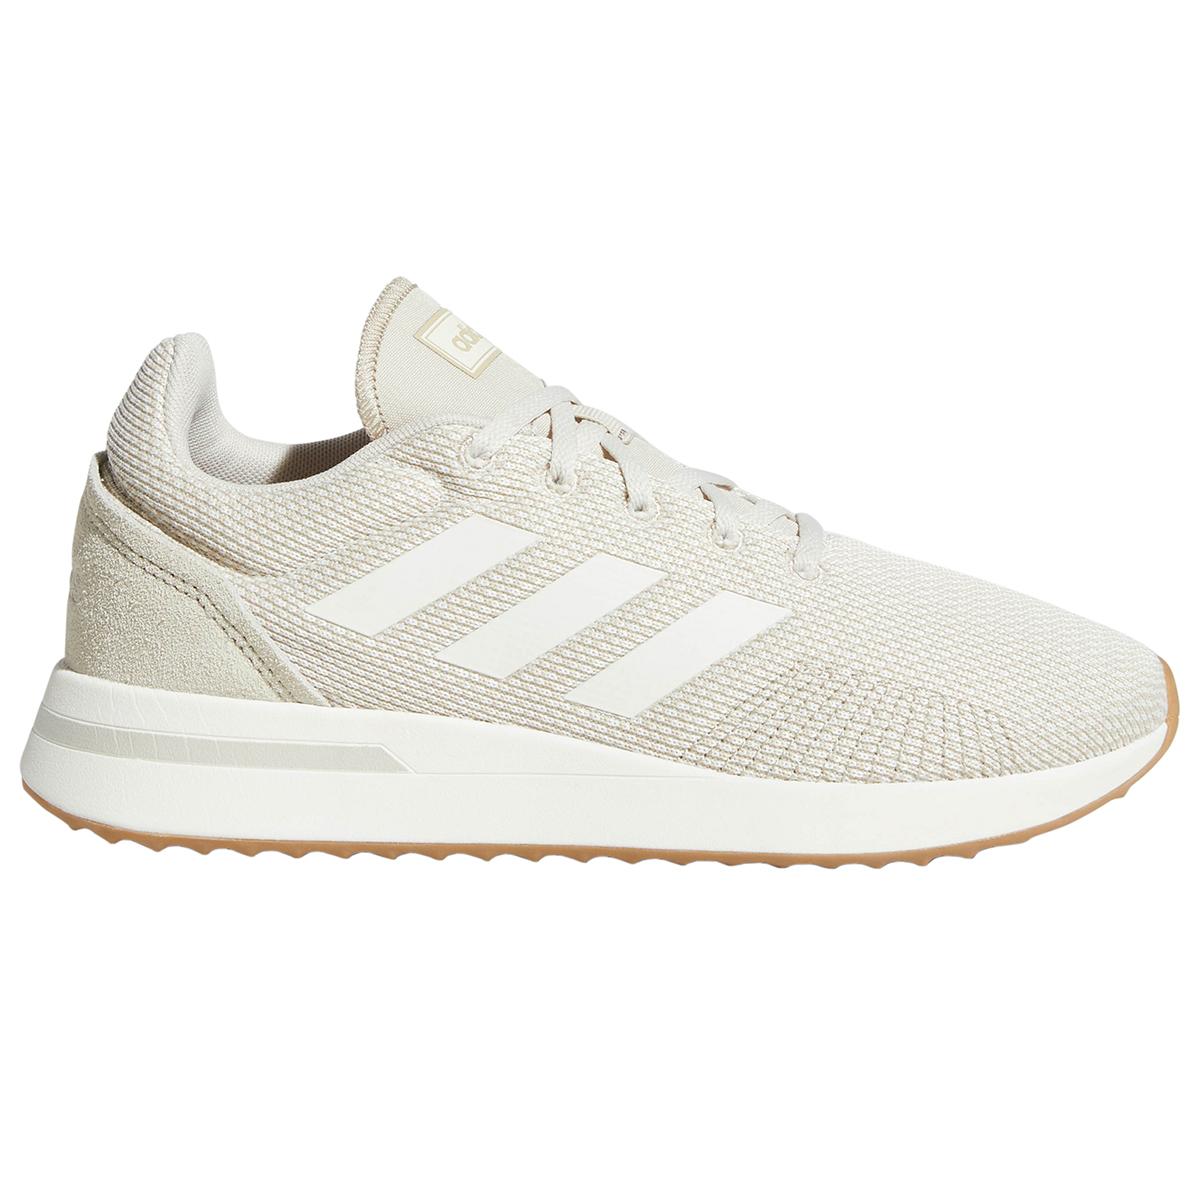 Adidas Women's Essentials Run 70S Running Shoes - Brown, 8